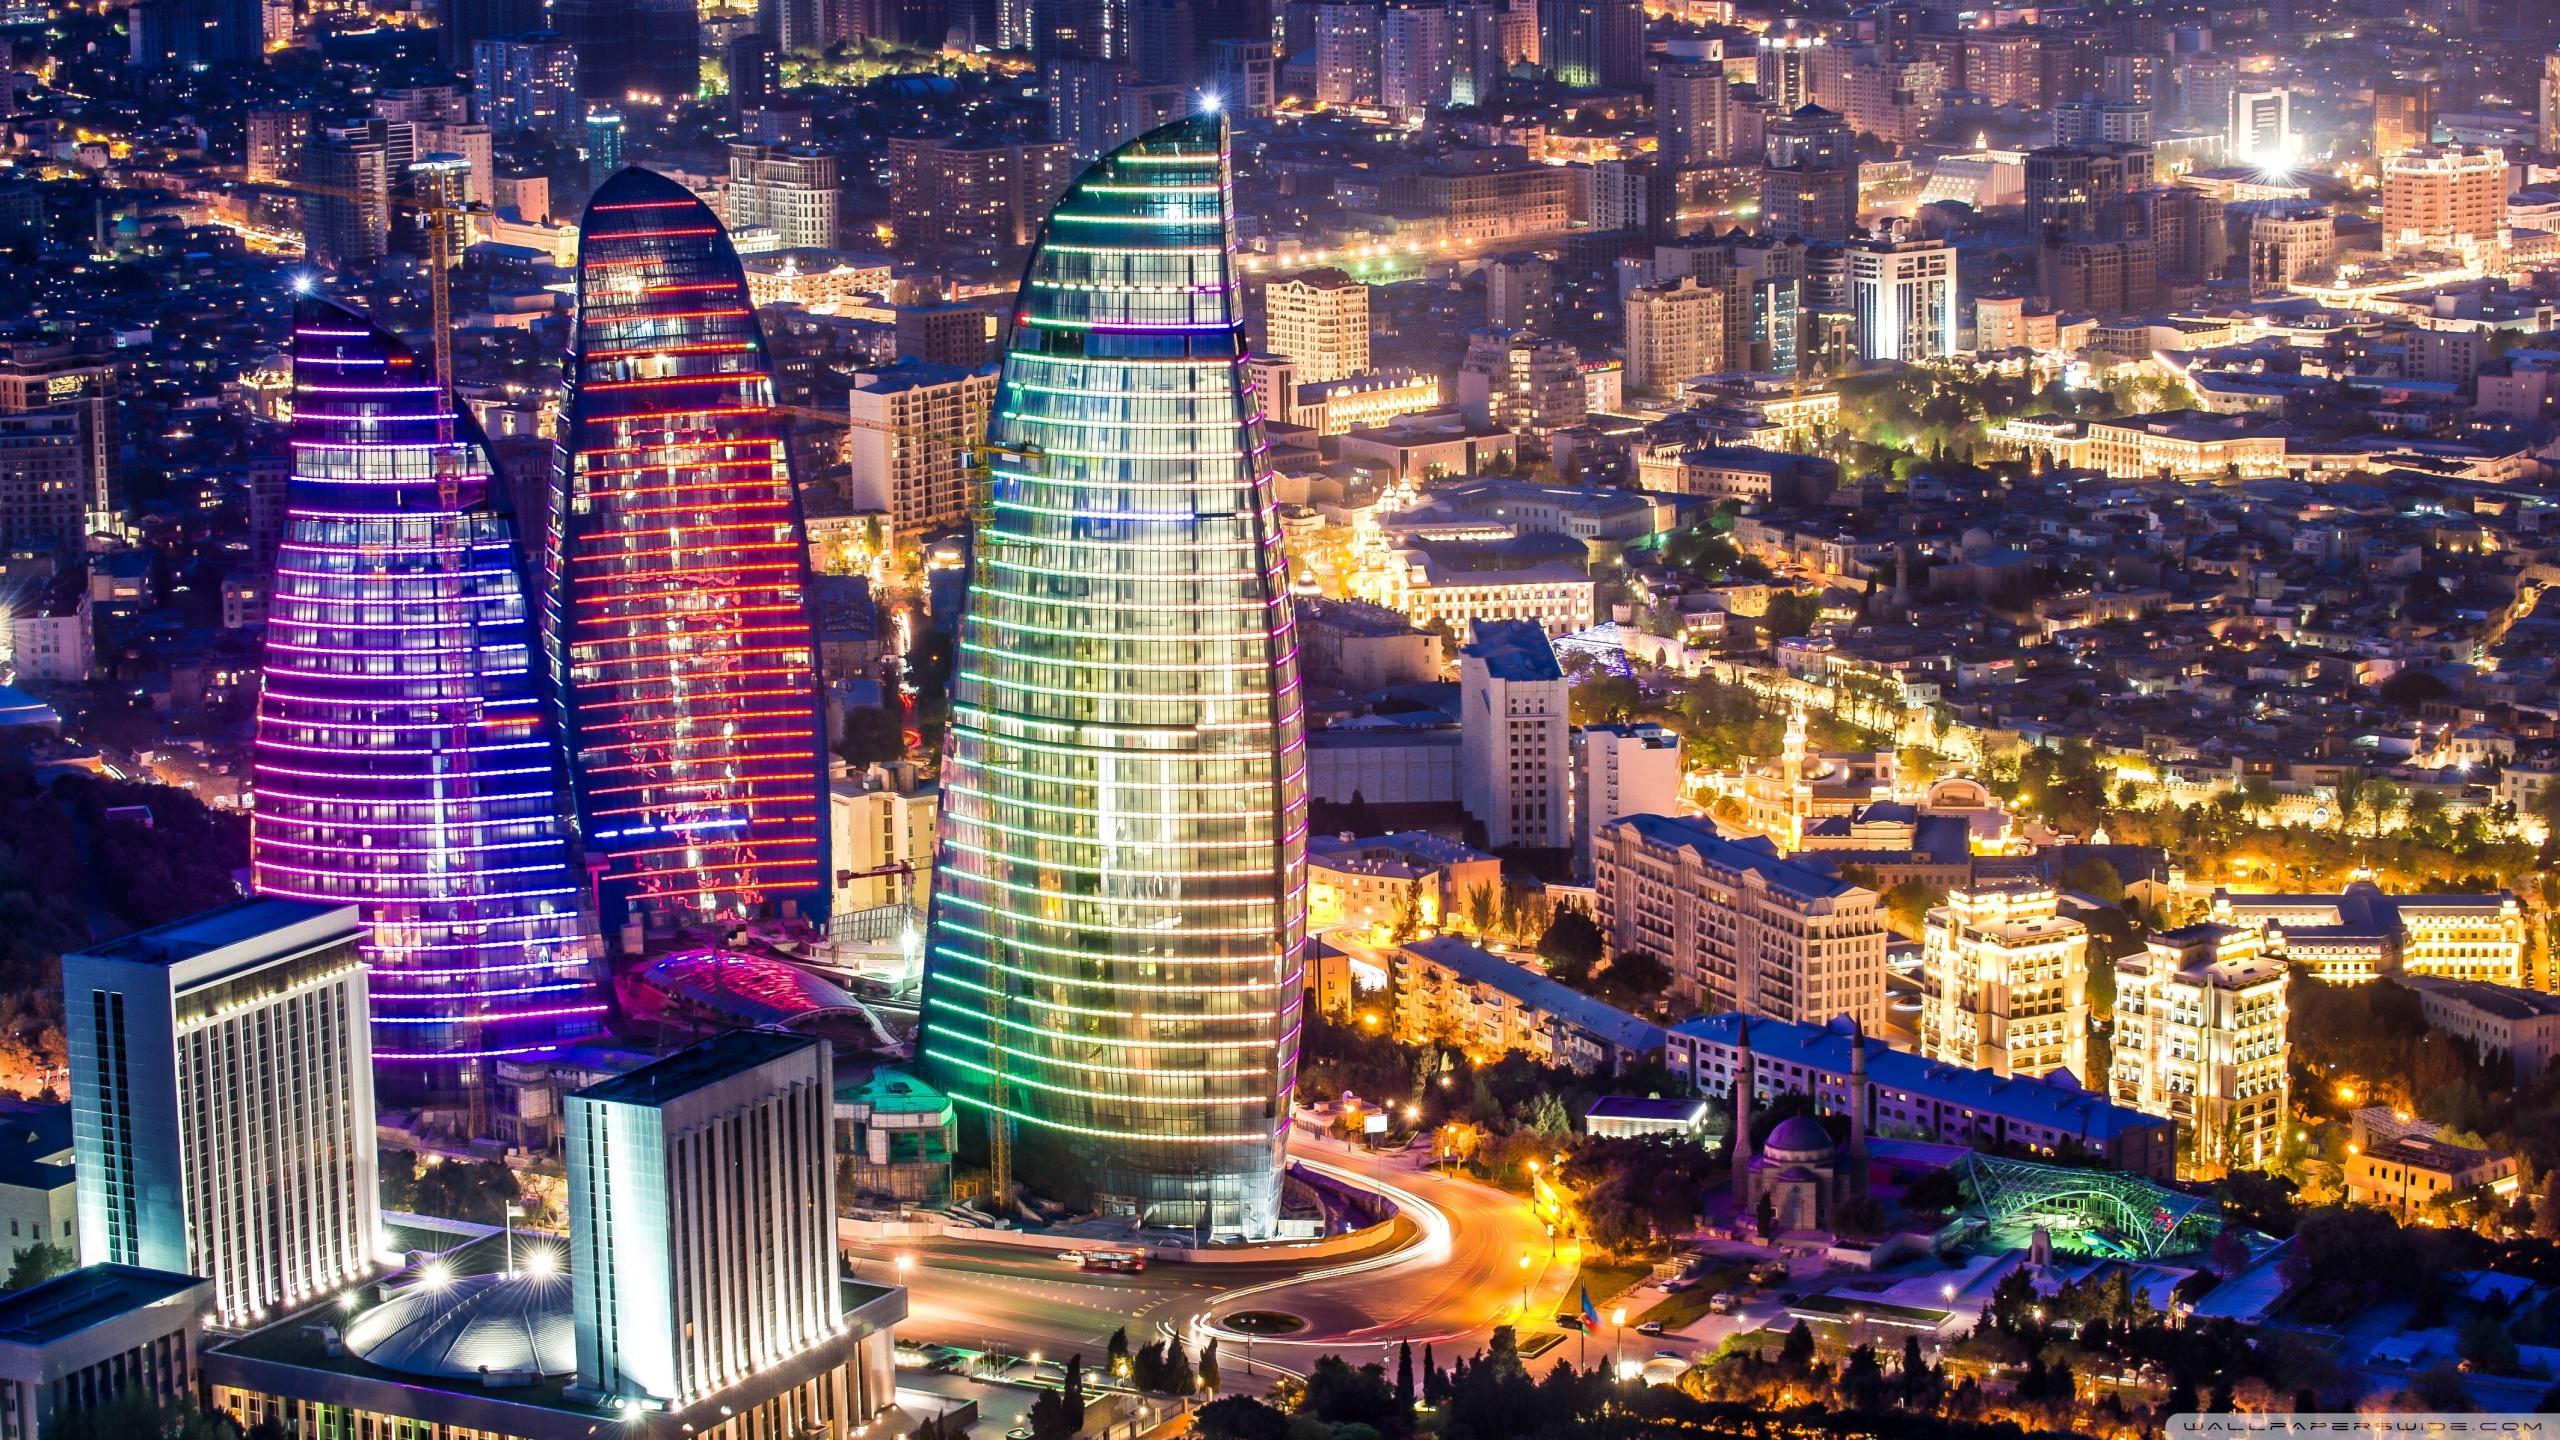 Flame Towers Baku Azerbaijan 4K HD Desktop Wallpaper for 2560x1440